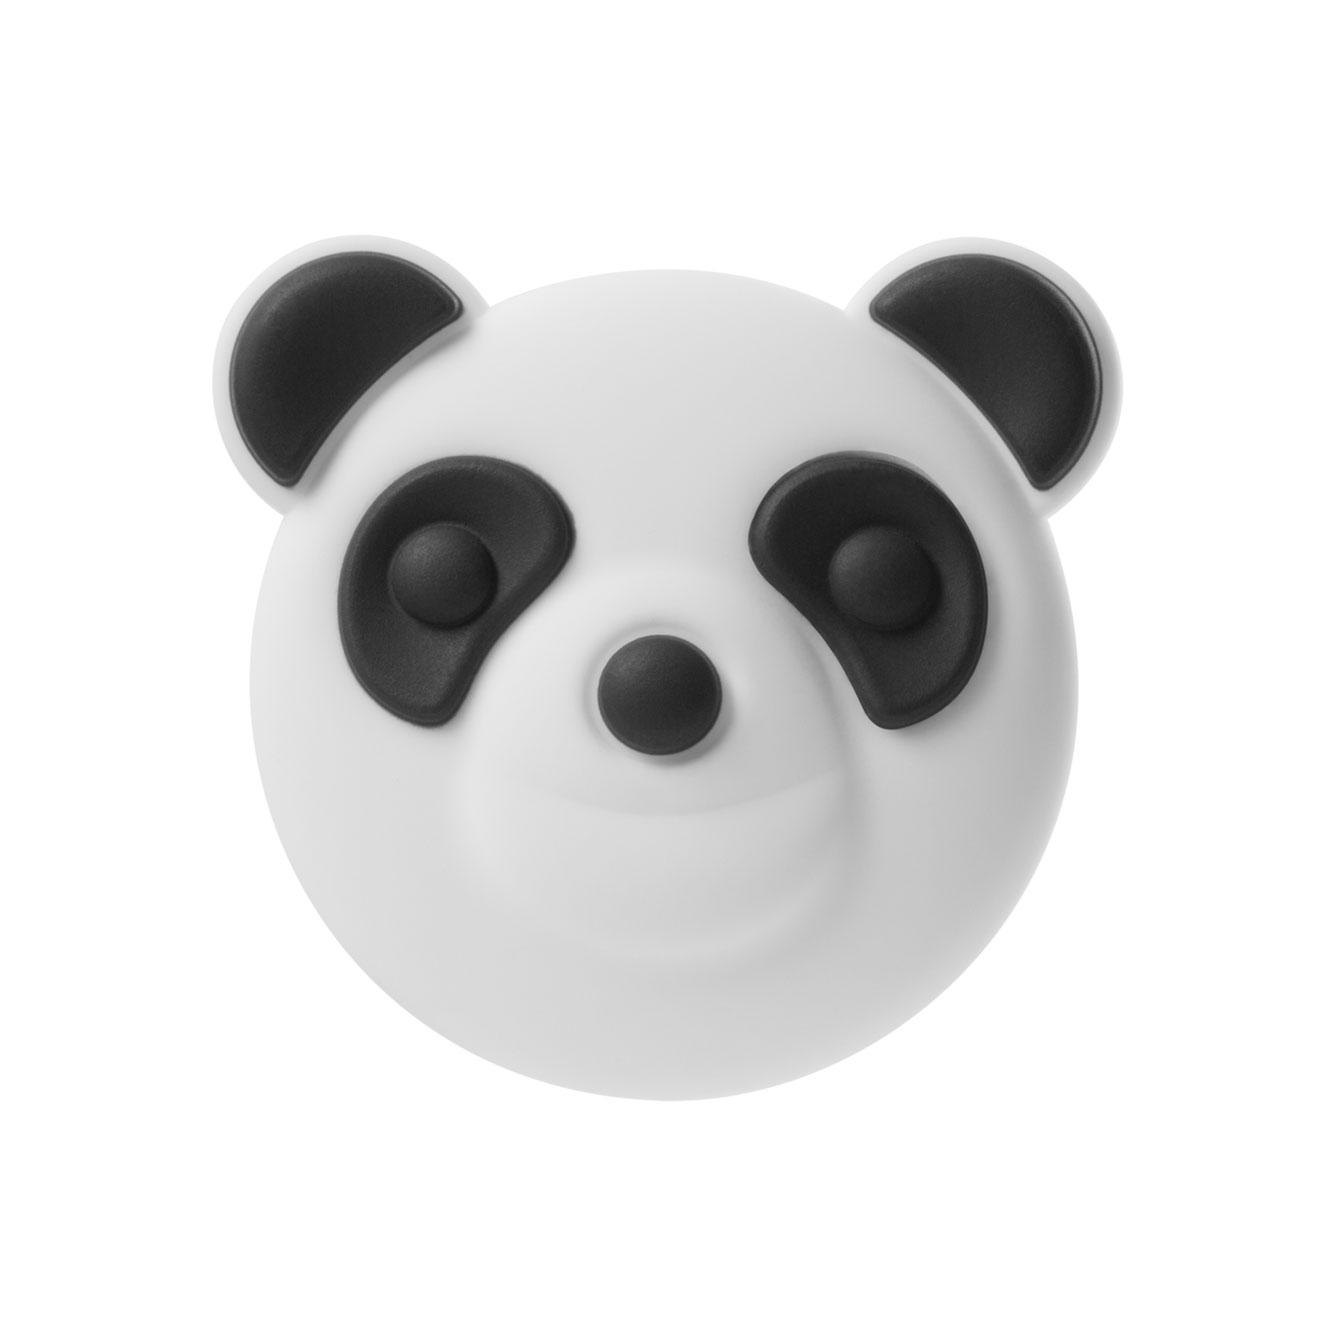 【Bone】Bone 可換式造型大逗扣-貓熊胖達